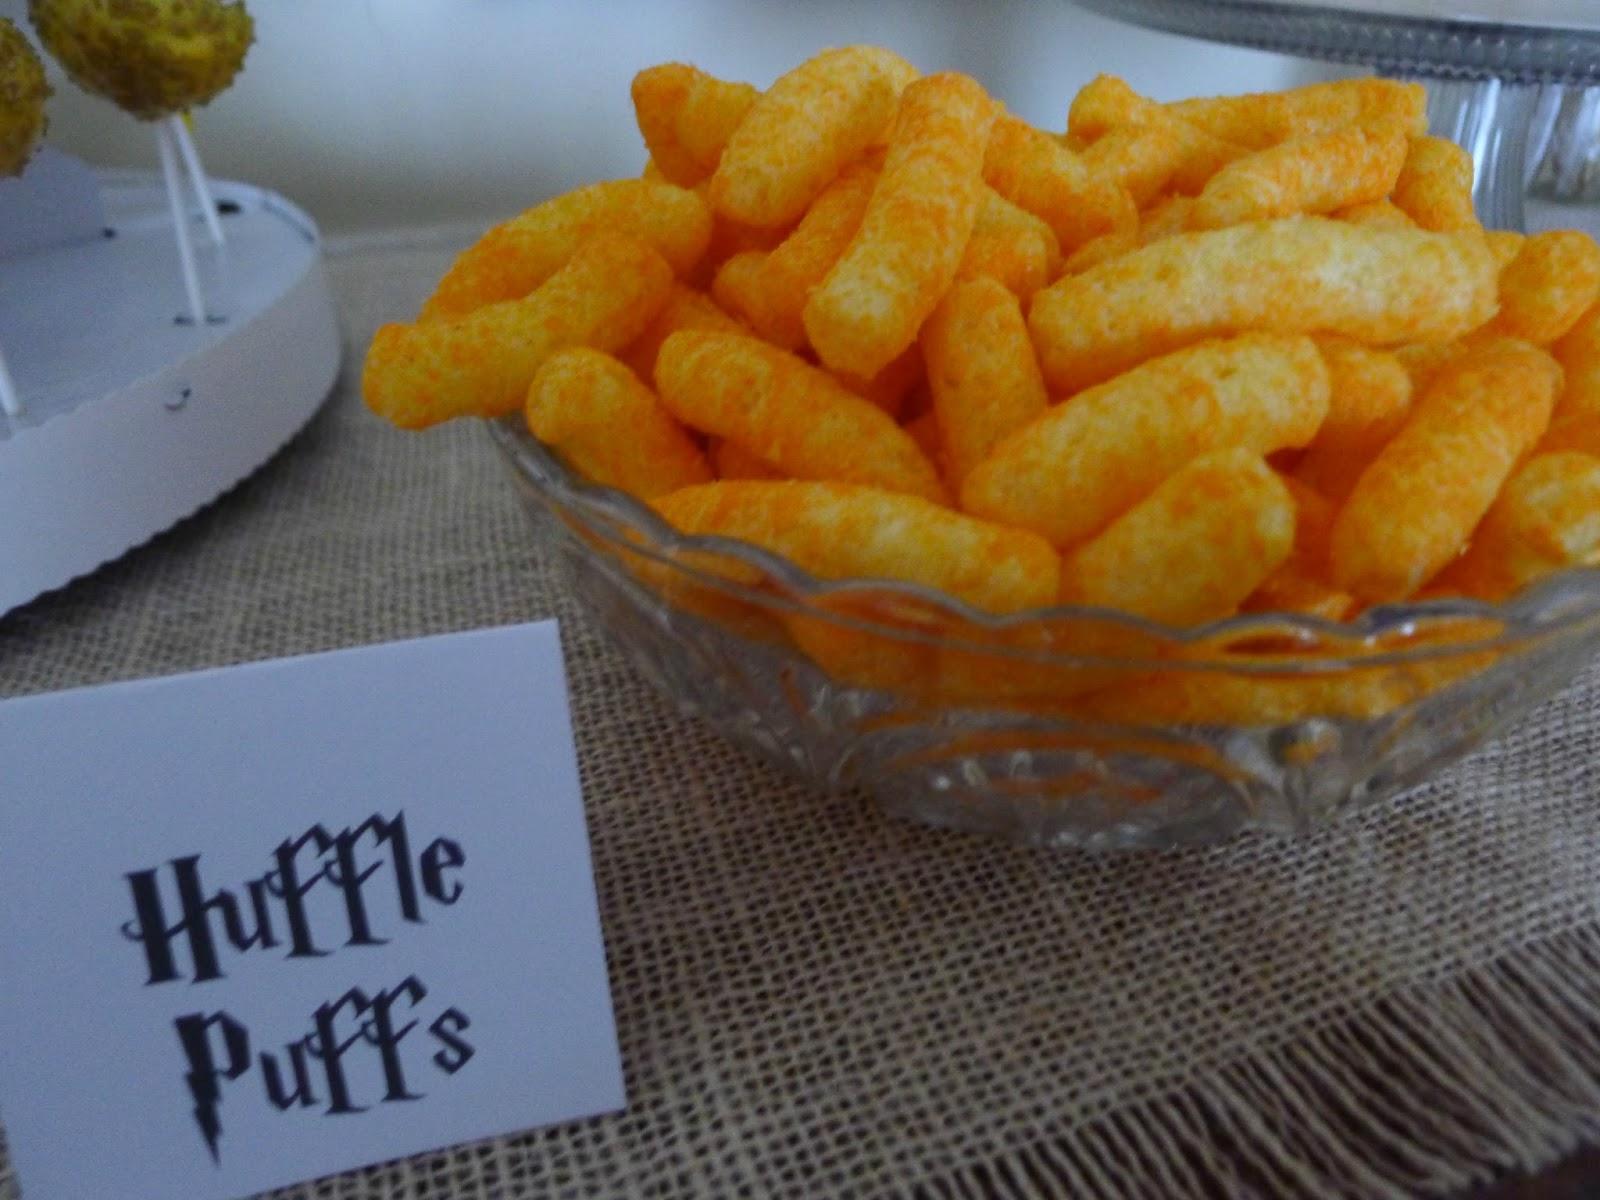 Snacks Food Huffle Puffs